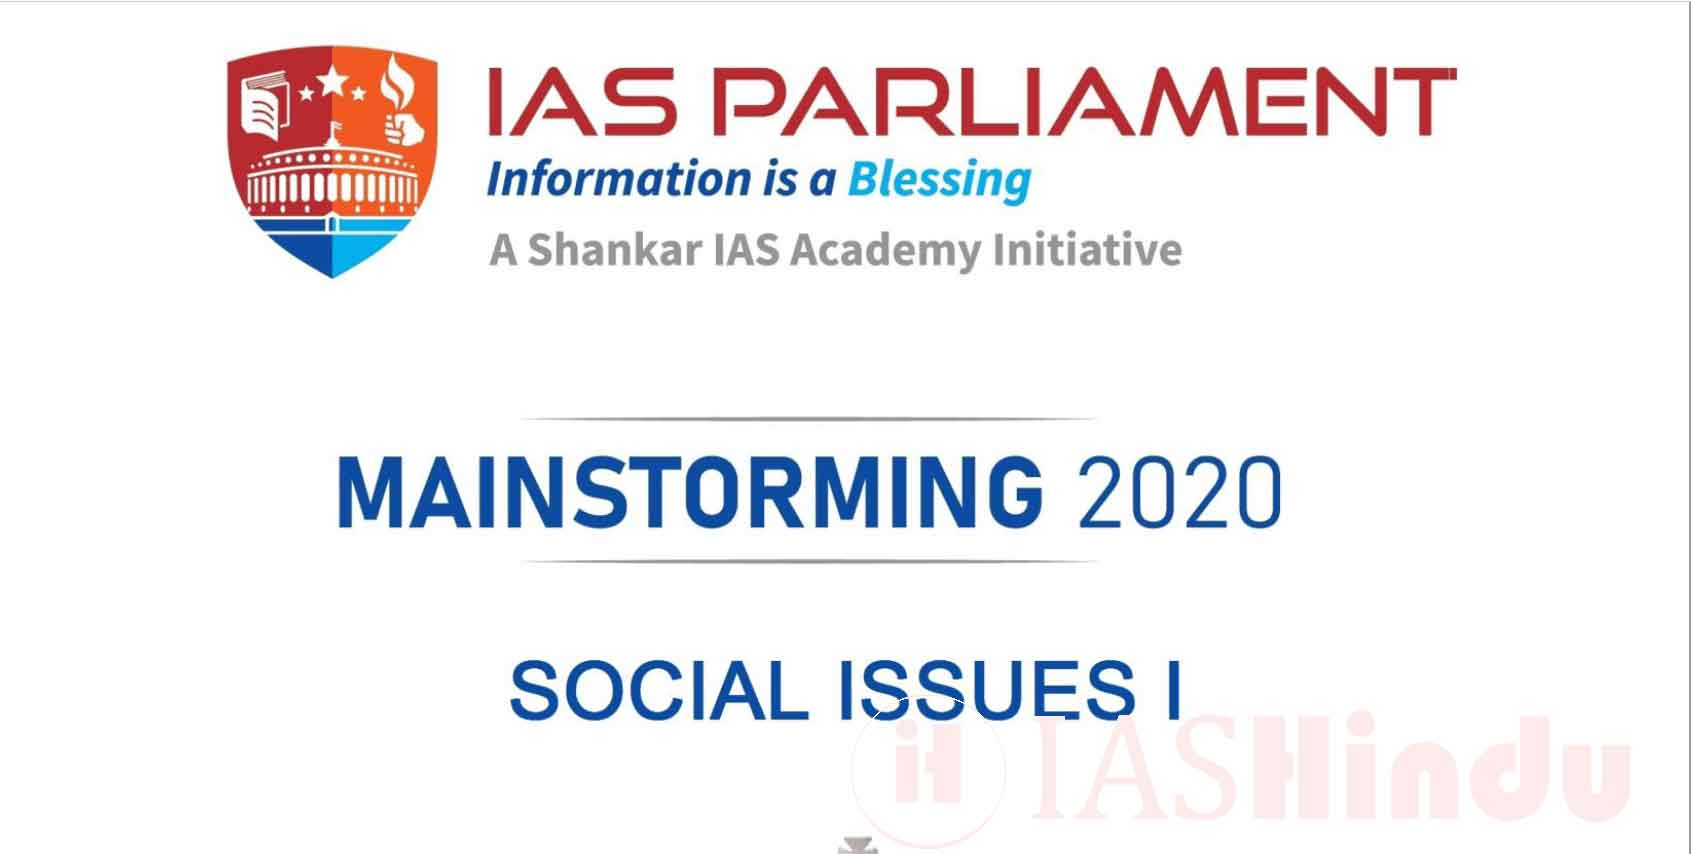 UPSC CSE Mains 2020 Social Issues I